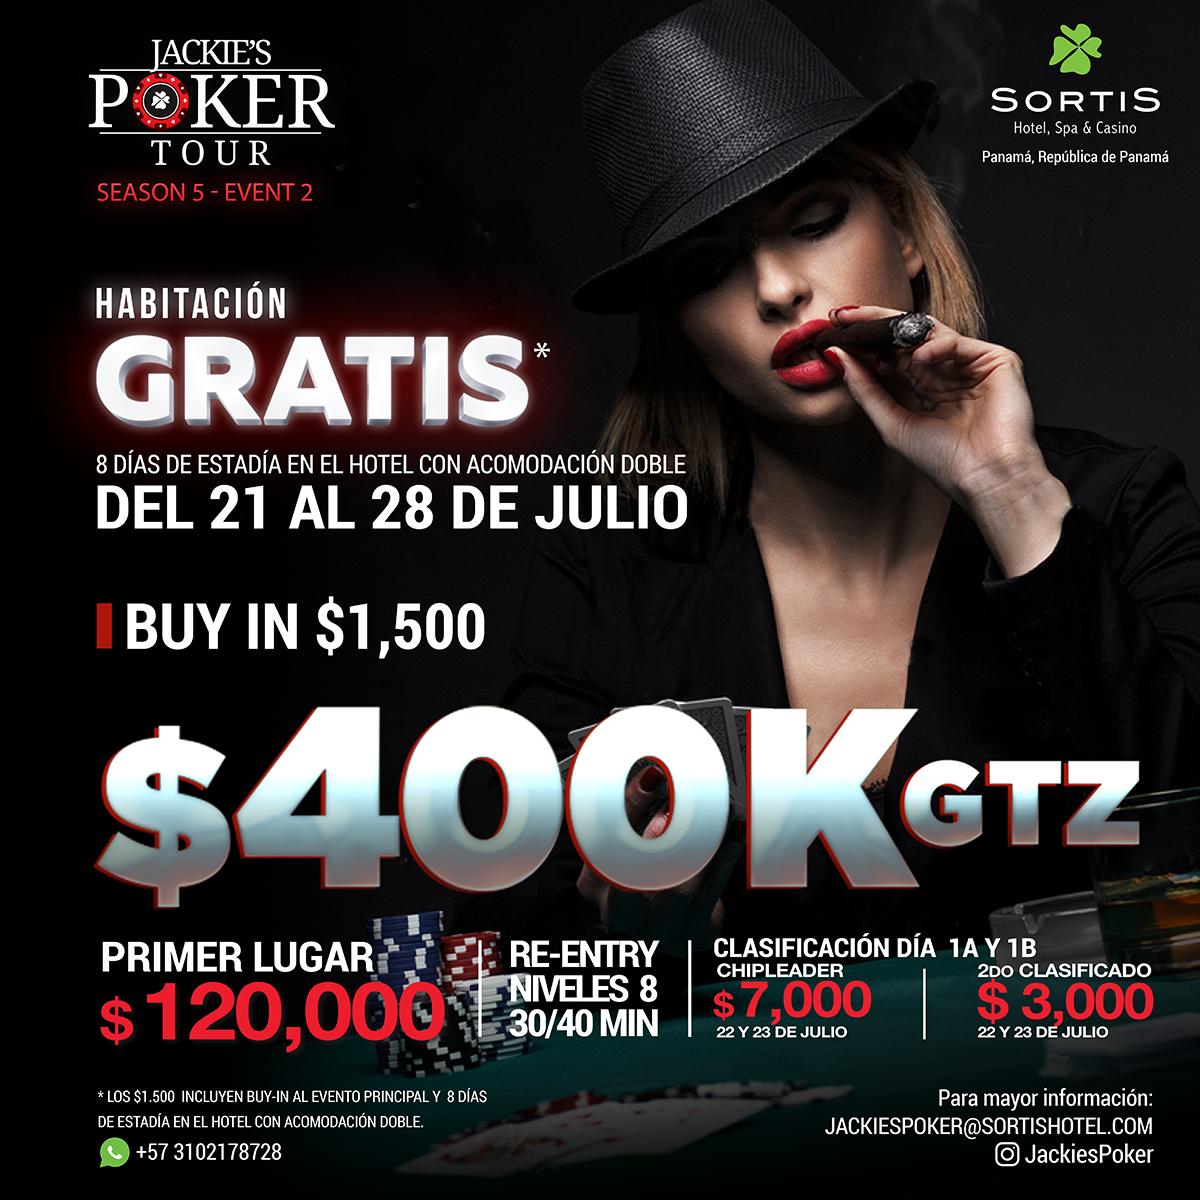 Torneo de PókerSeason 5 - Event 2con $400k GTZ